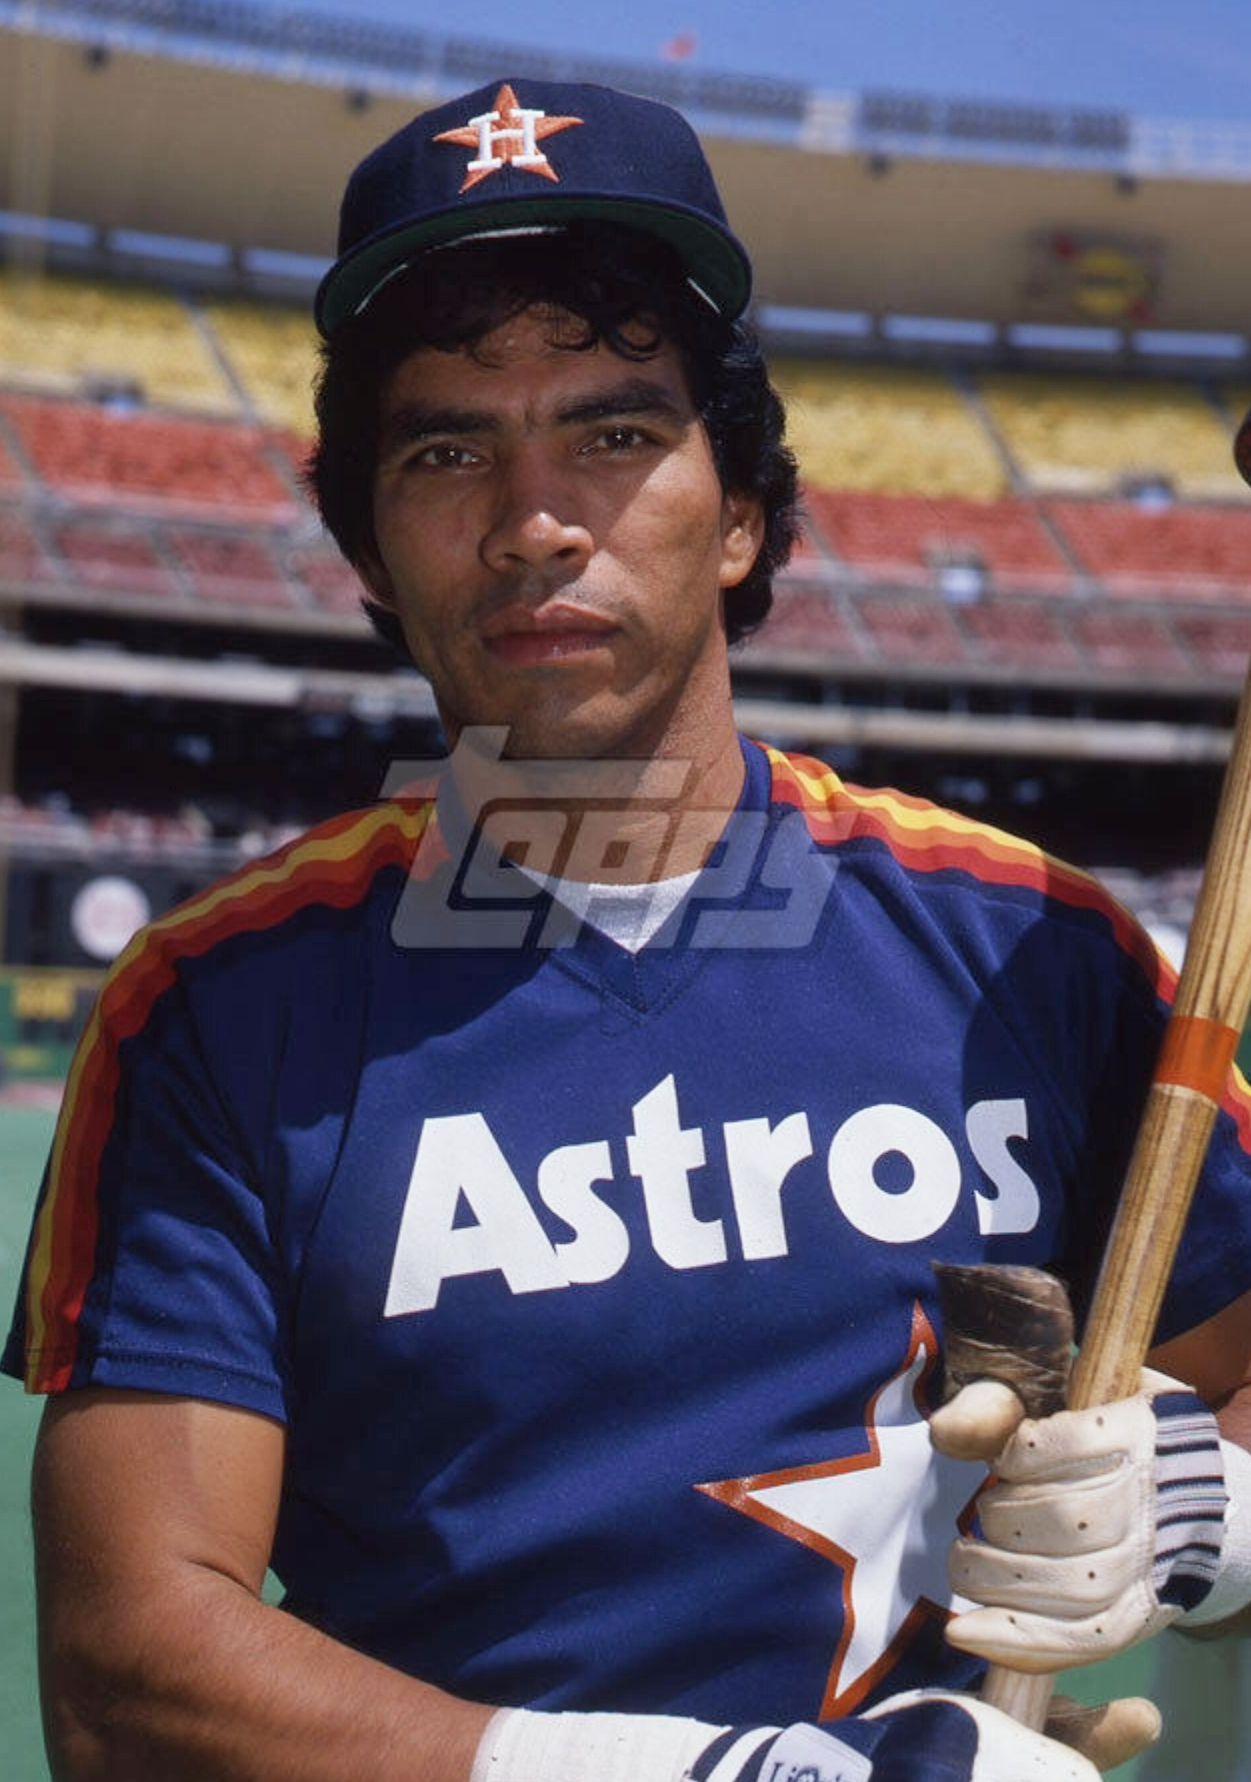 Jose Cruz Houston astros baseball, Astros baseball, Best